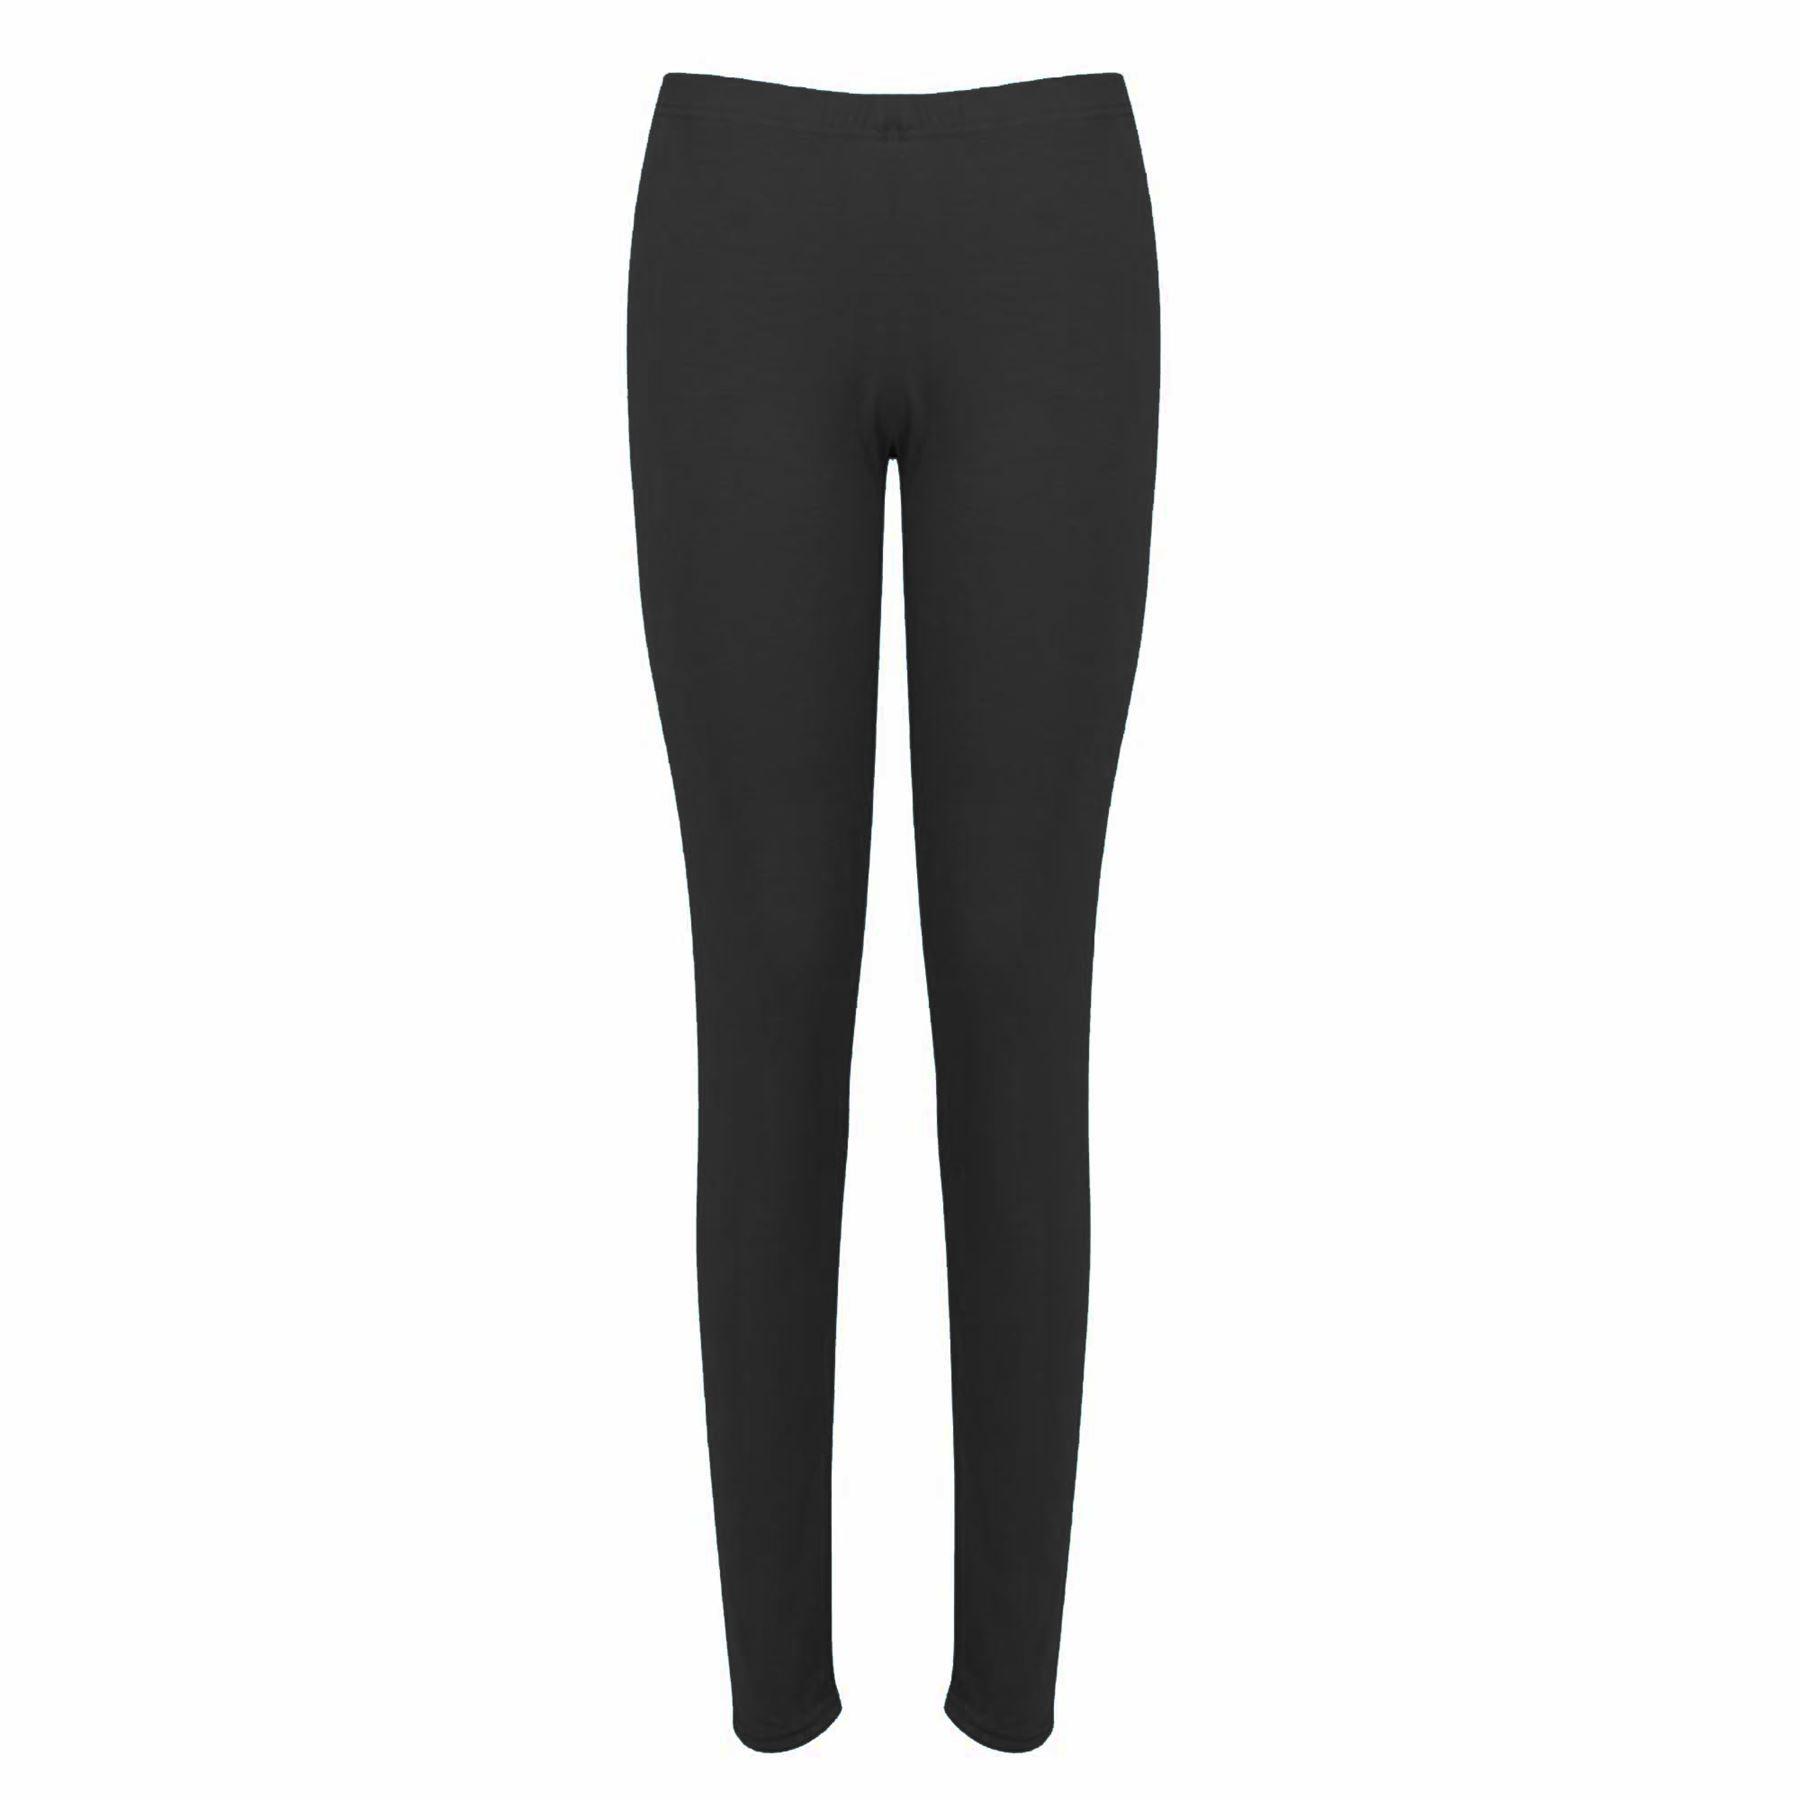 Womens Ladies Full Ankle Length Plain Basic Stretchy Trousers Pants Leggings